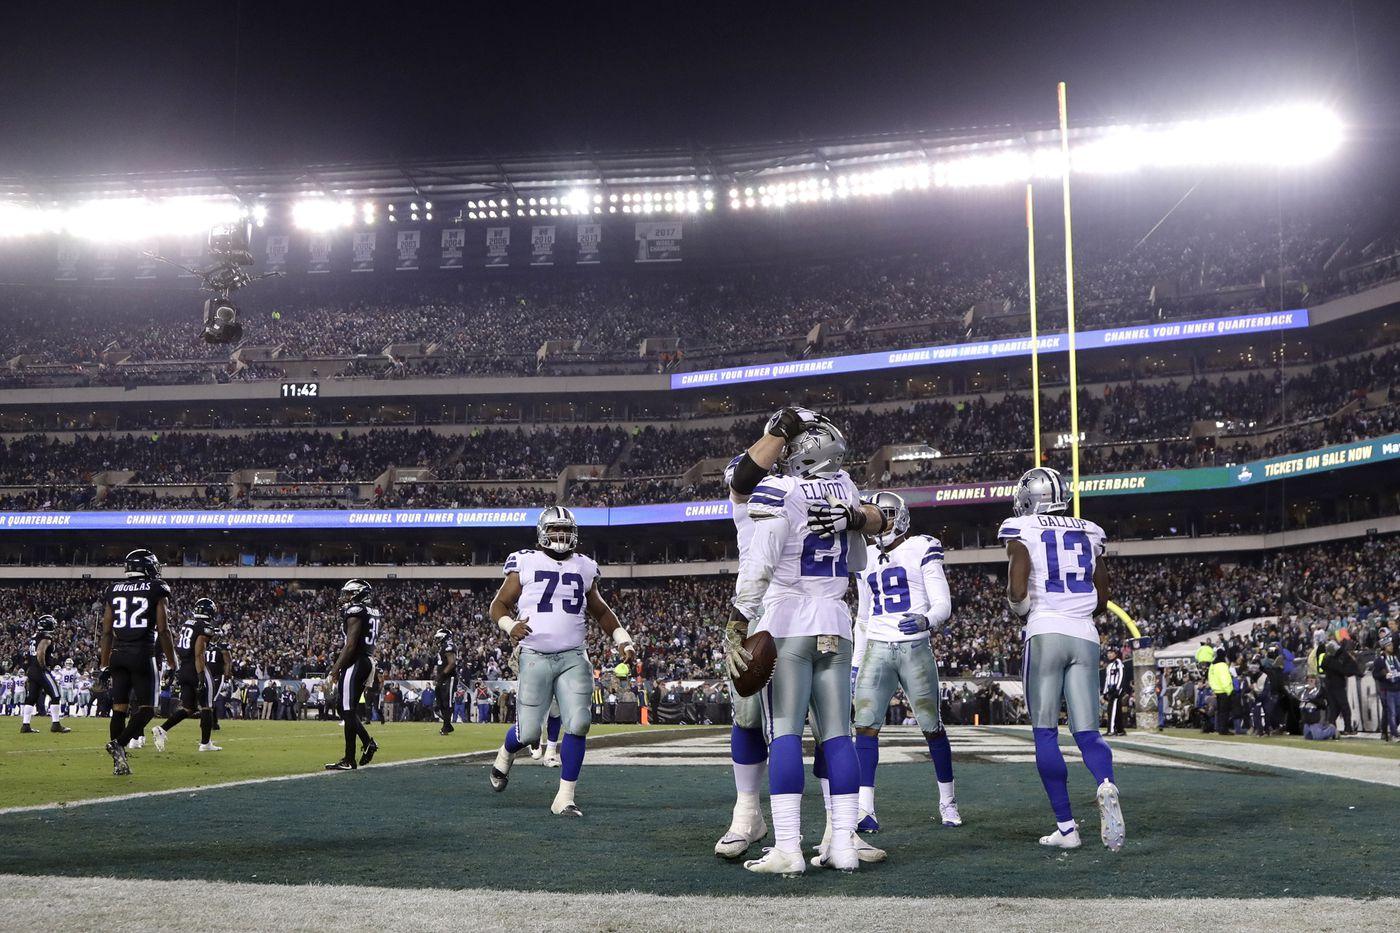 7b57a7079 Dallas Cowboys running back Ezekiel Elliott (21) is congratulated by  teammates after catching a